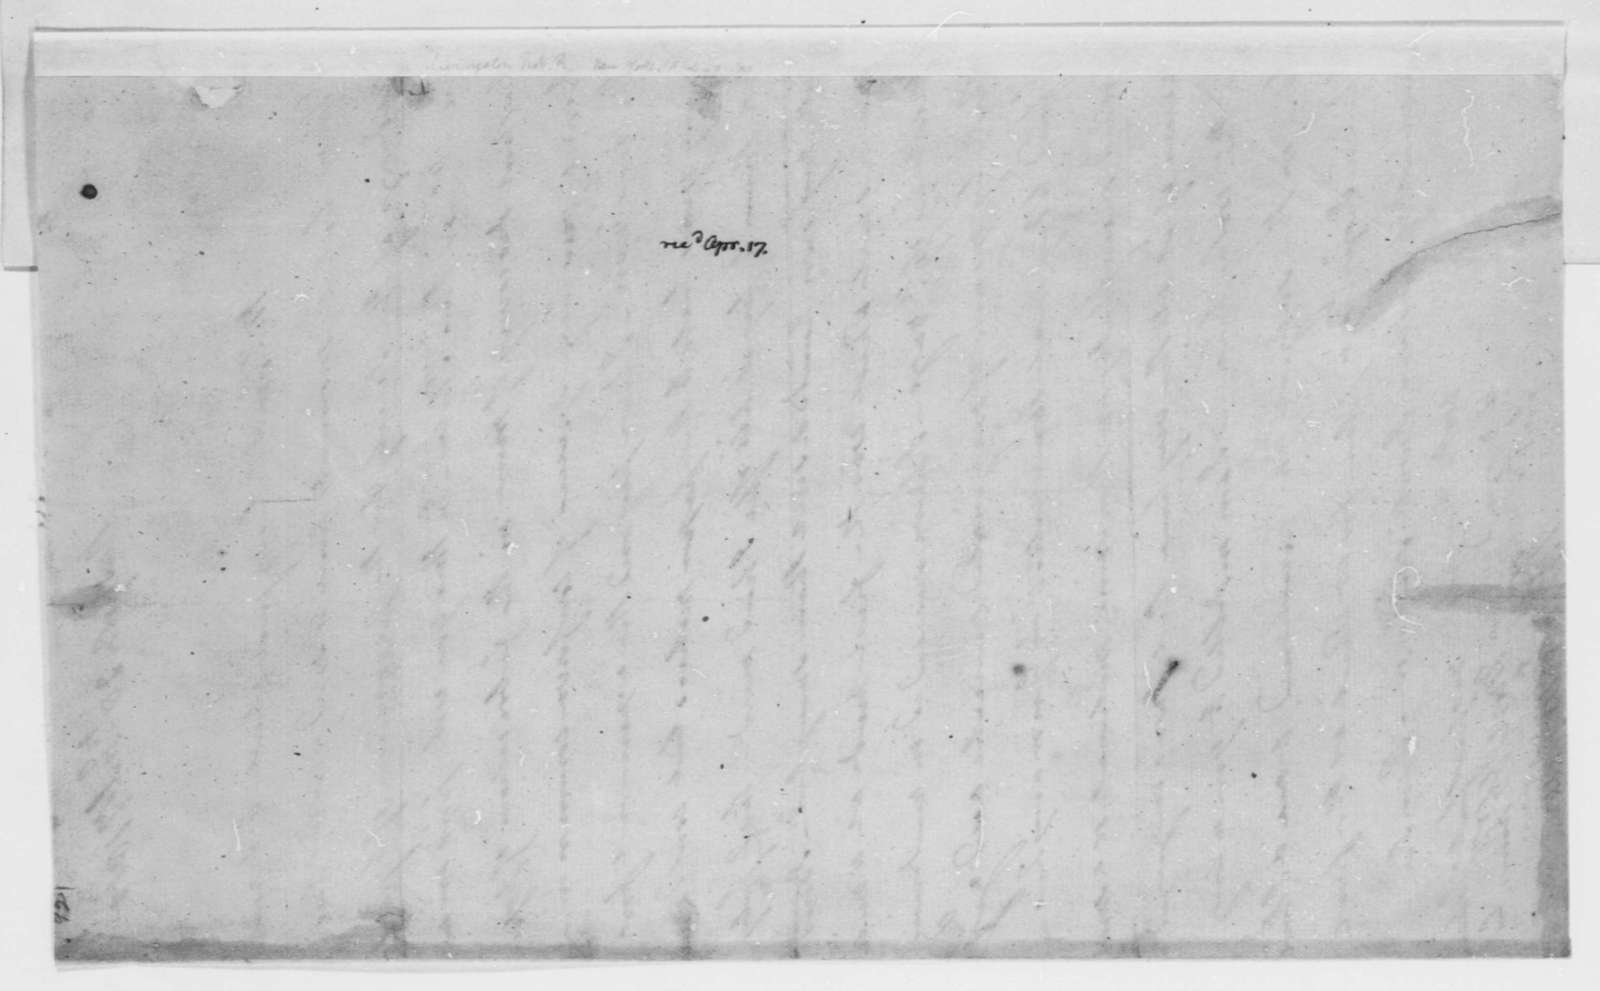 Robert R. Livingston to Thomas Jefferson, February 28, 1800